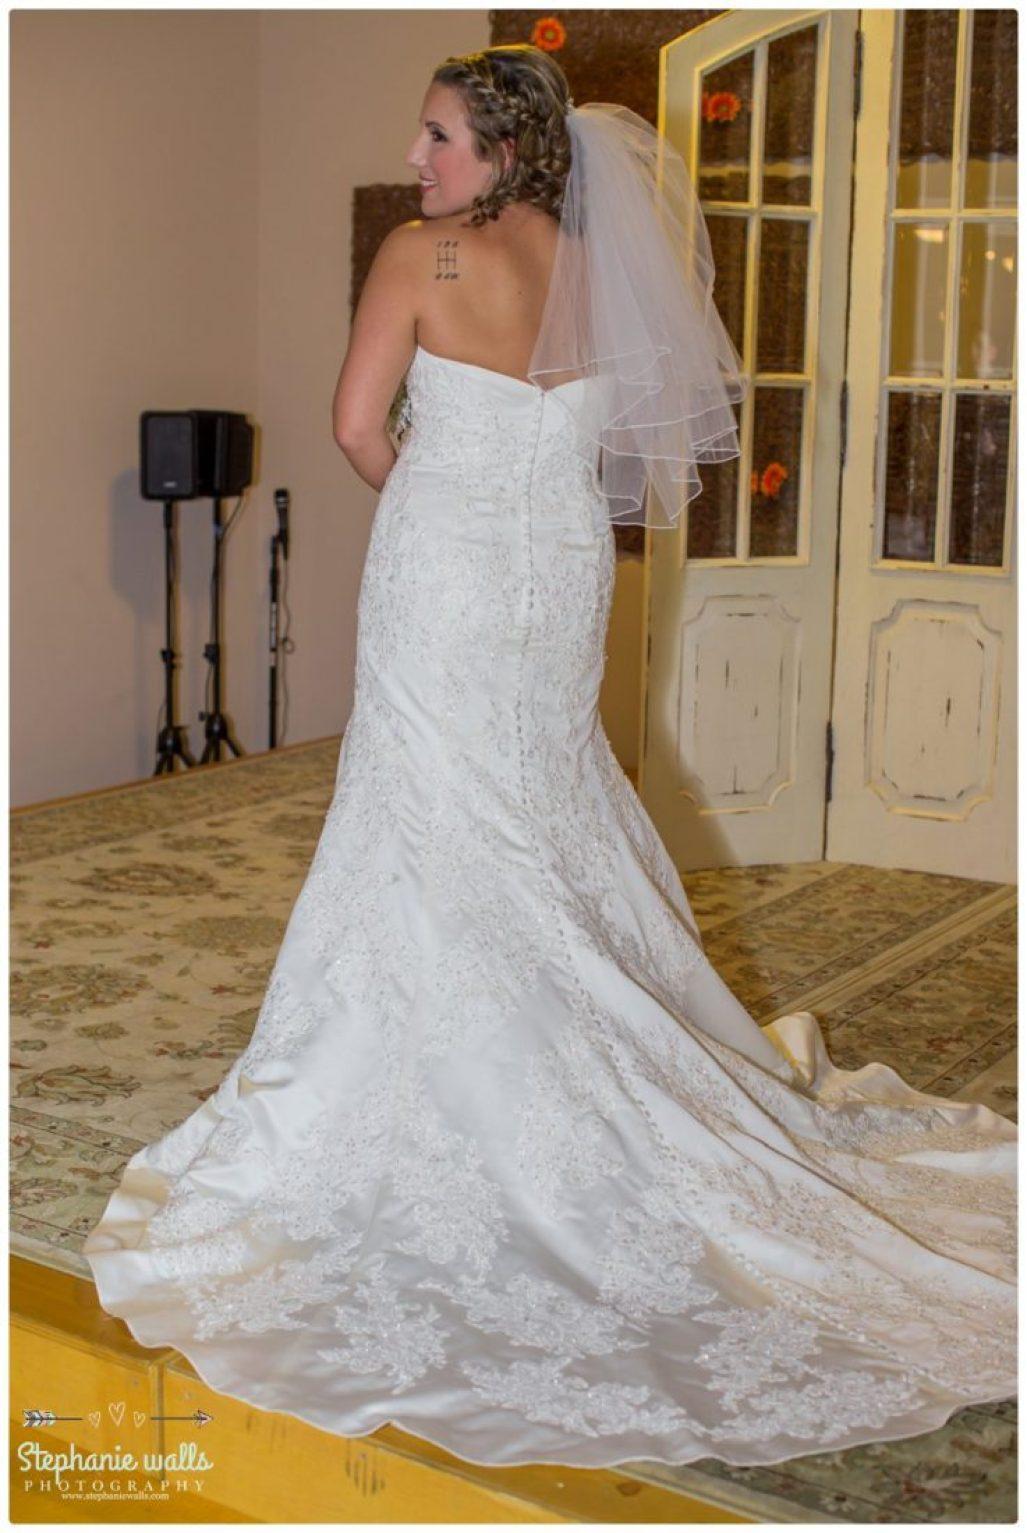 2016 03 24 0054 Racing Love   Snohomish Event Center   Snohomish Wedding Photographer